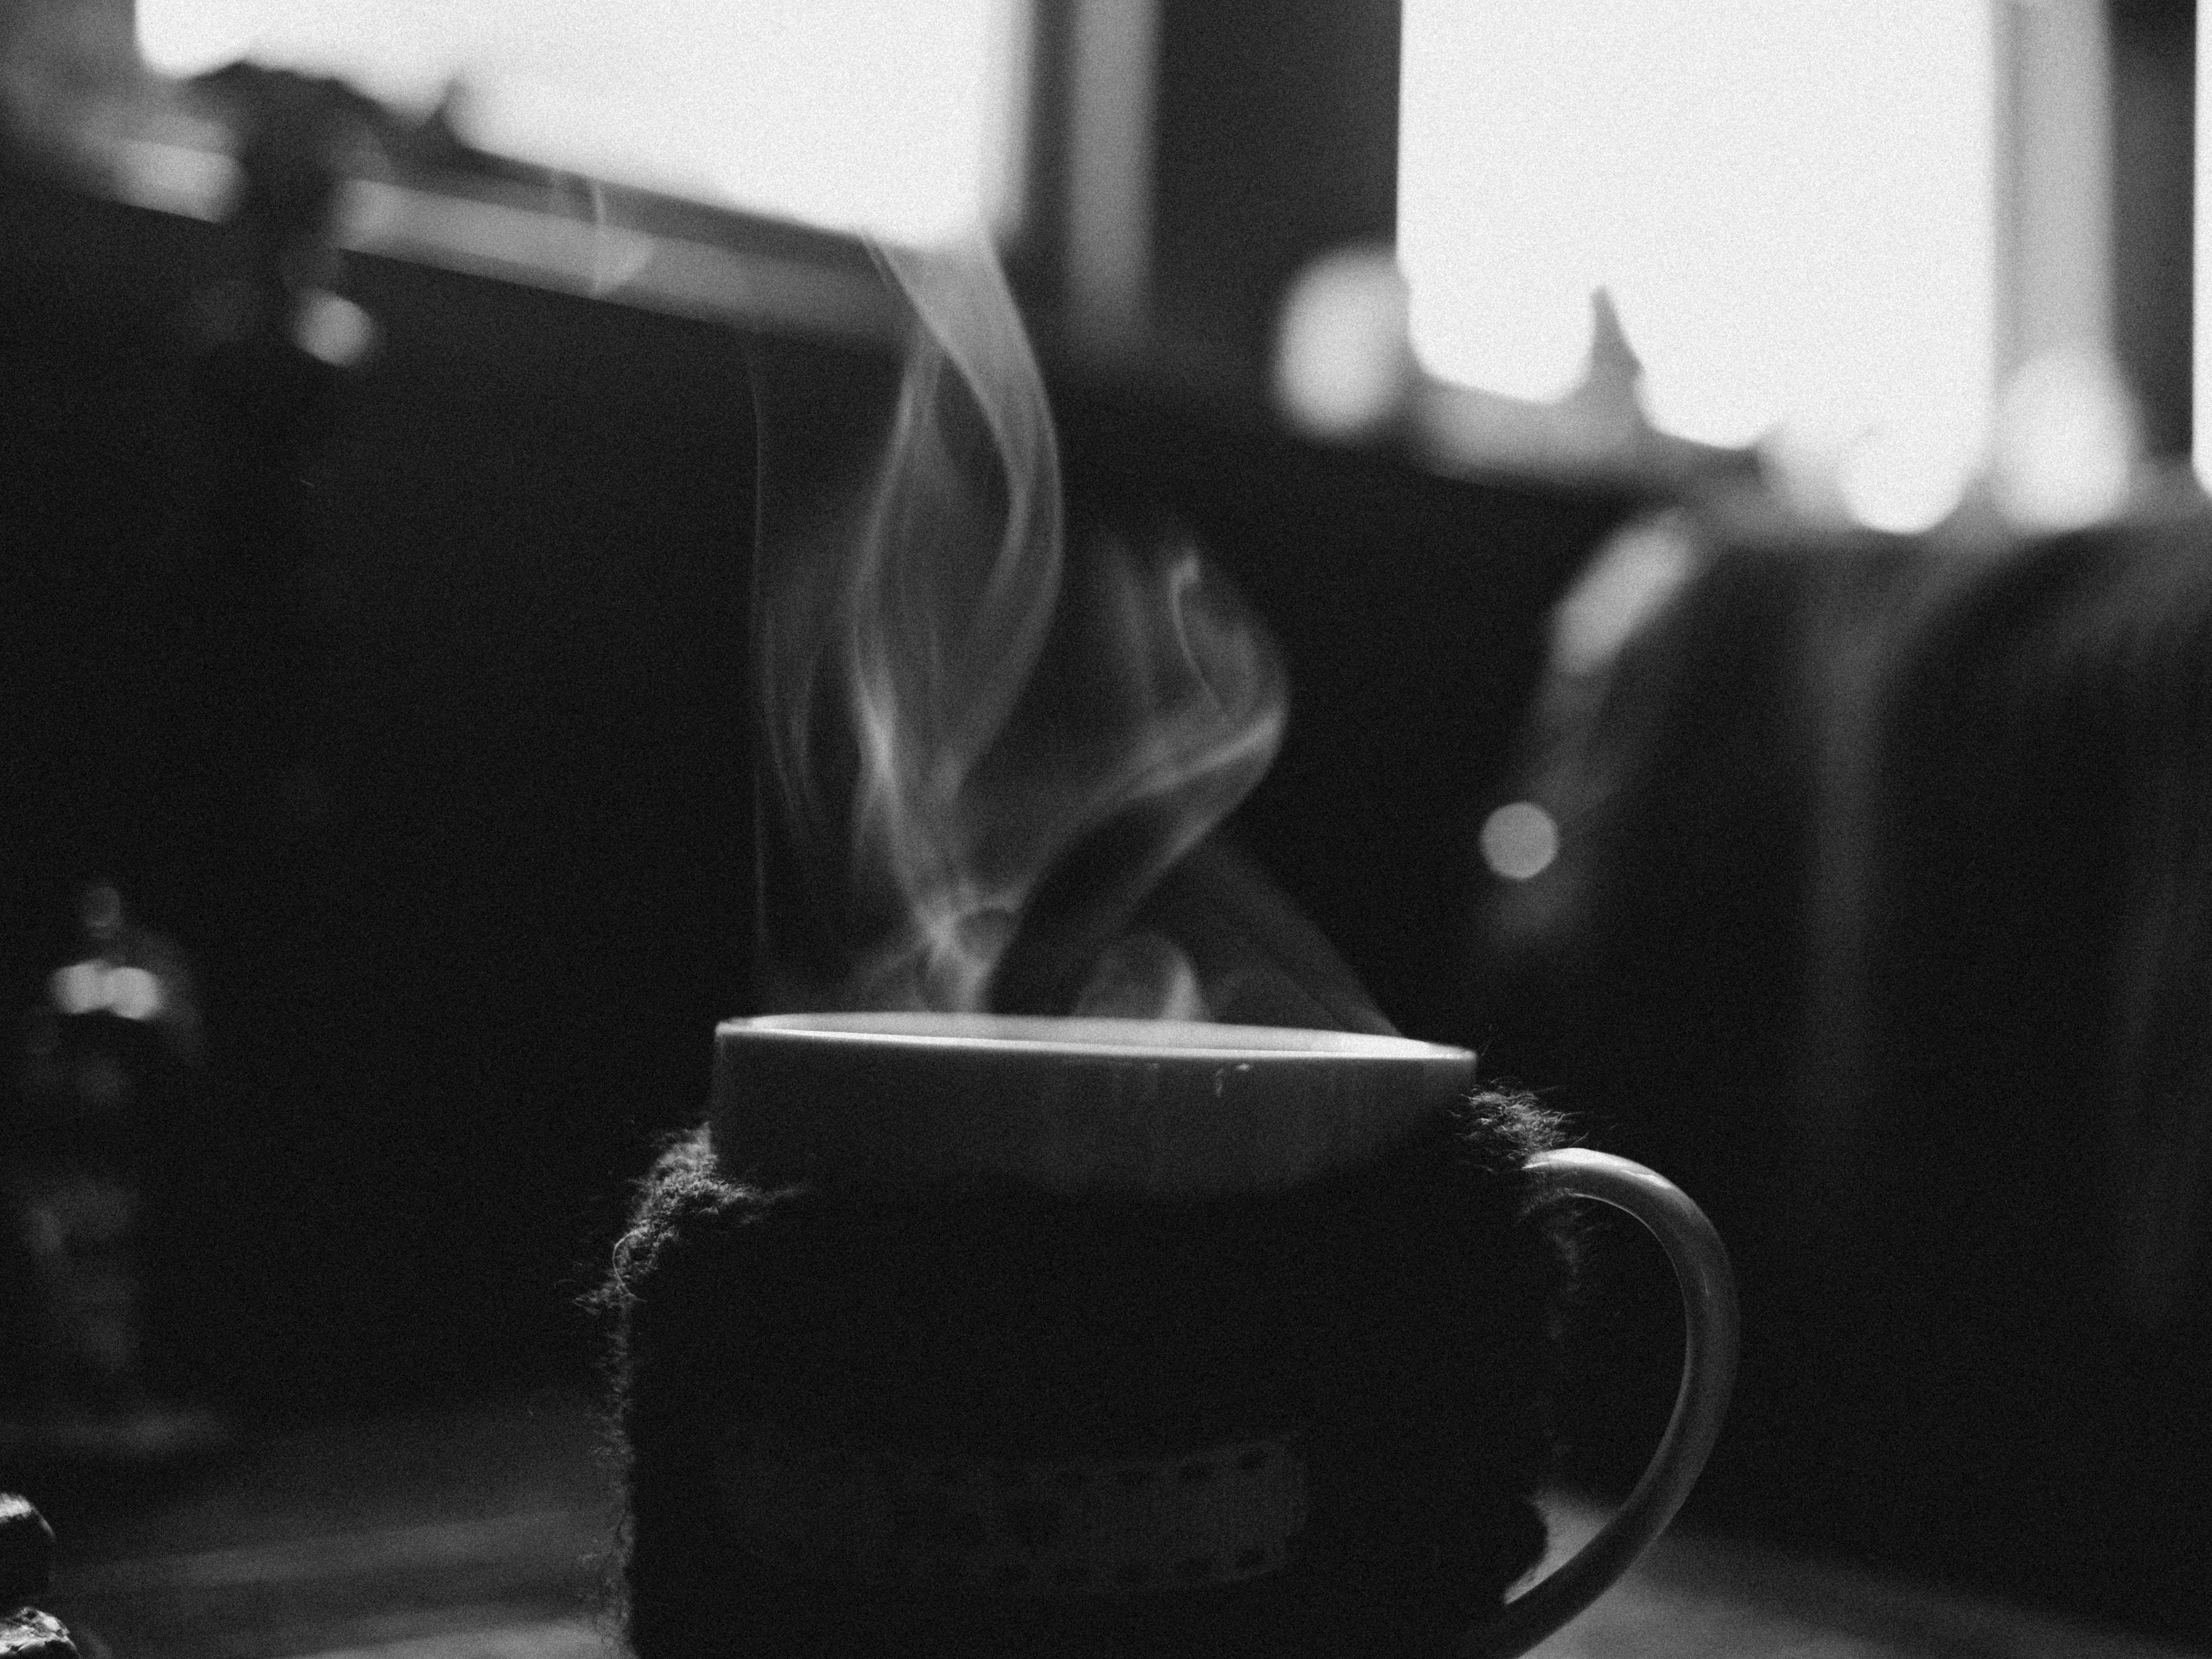 Grayscale Photo of Steaming Mug